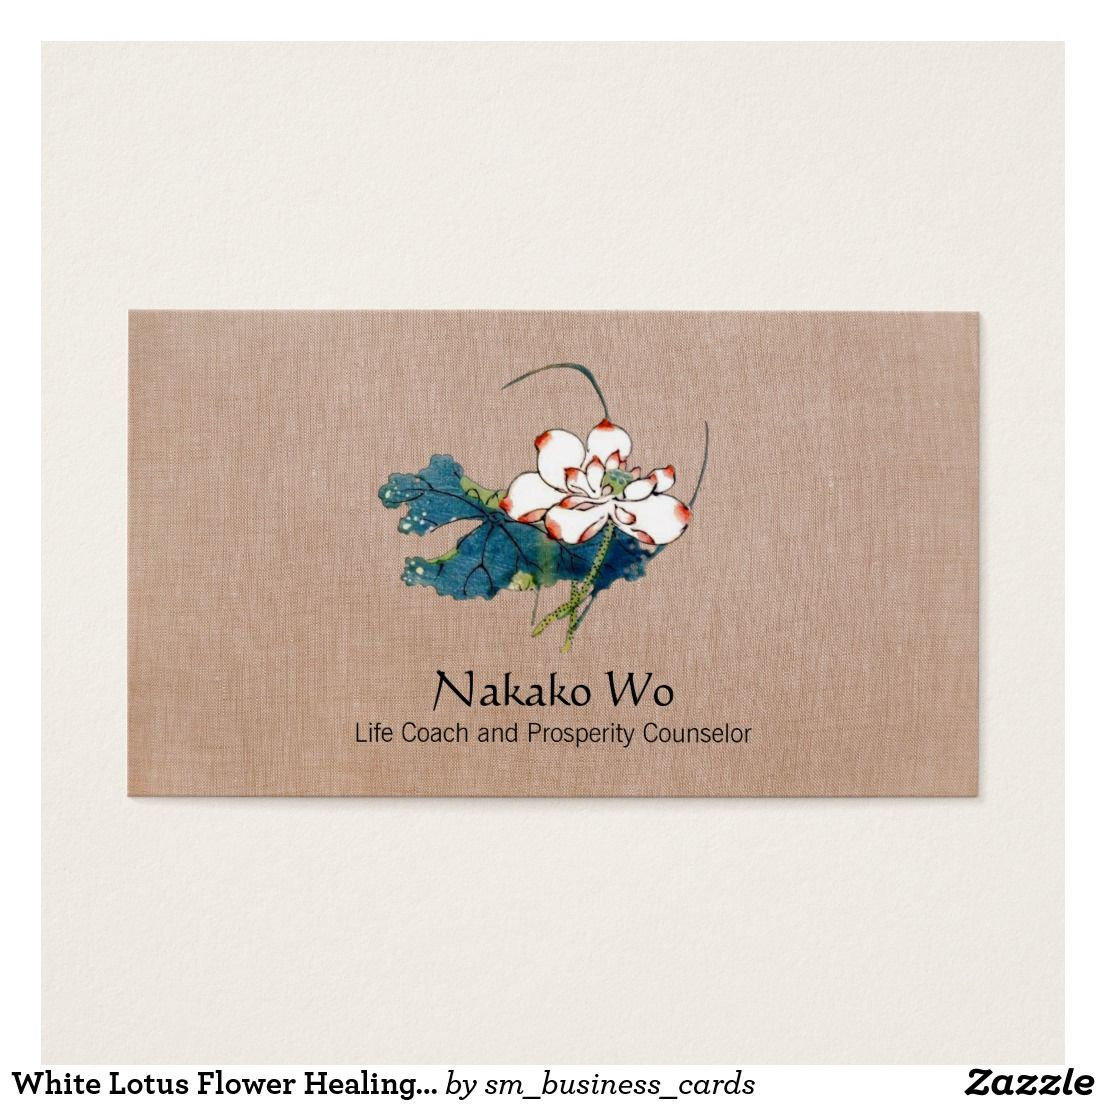 White Lotus Flower Healing Arts Holistic Health Business Card